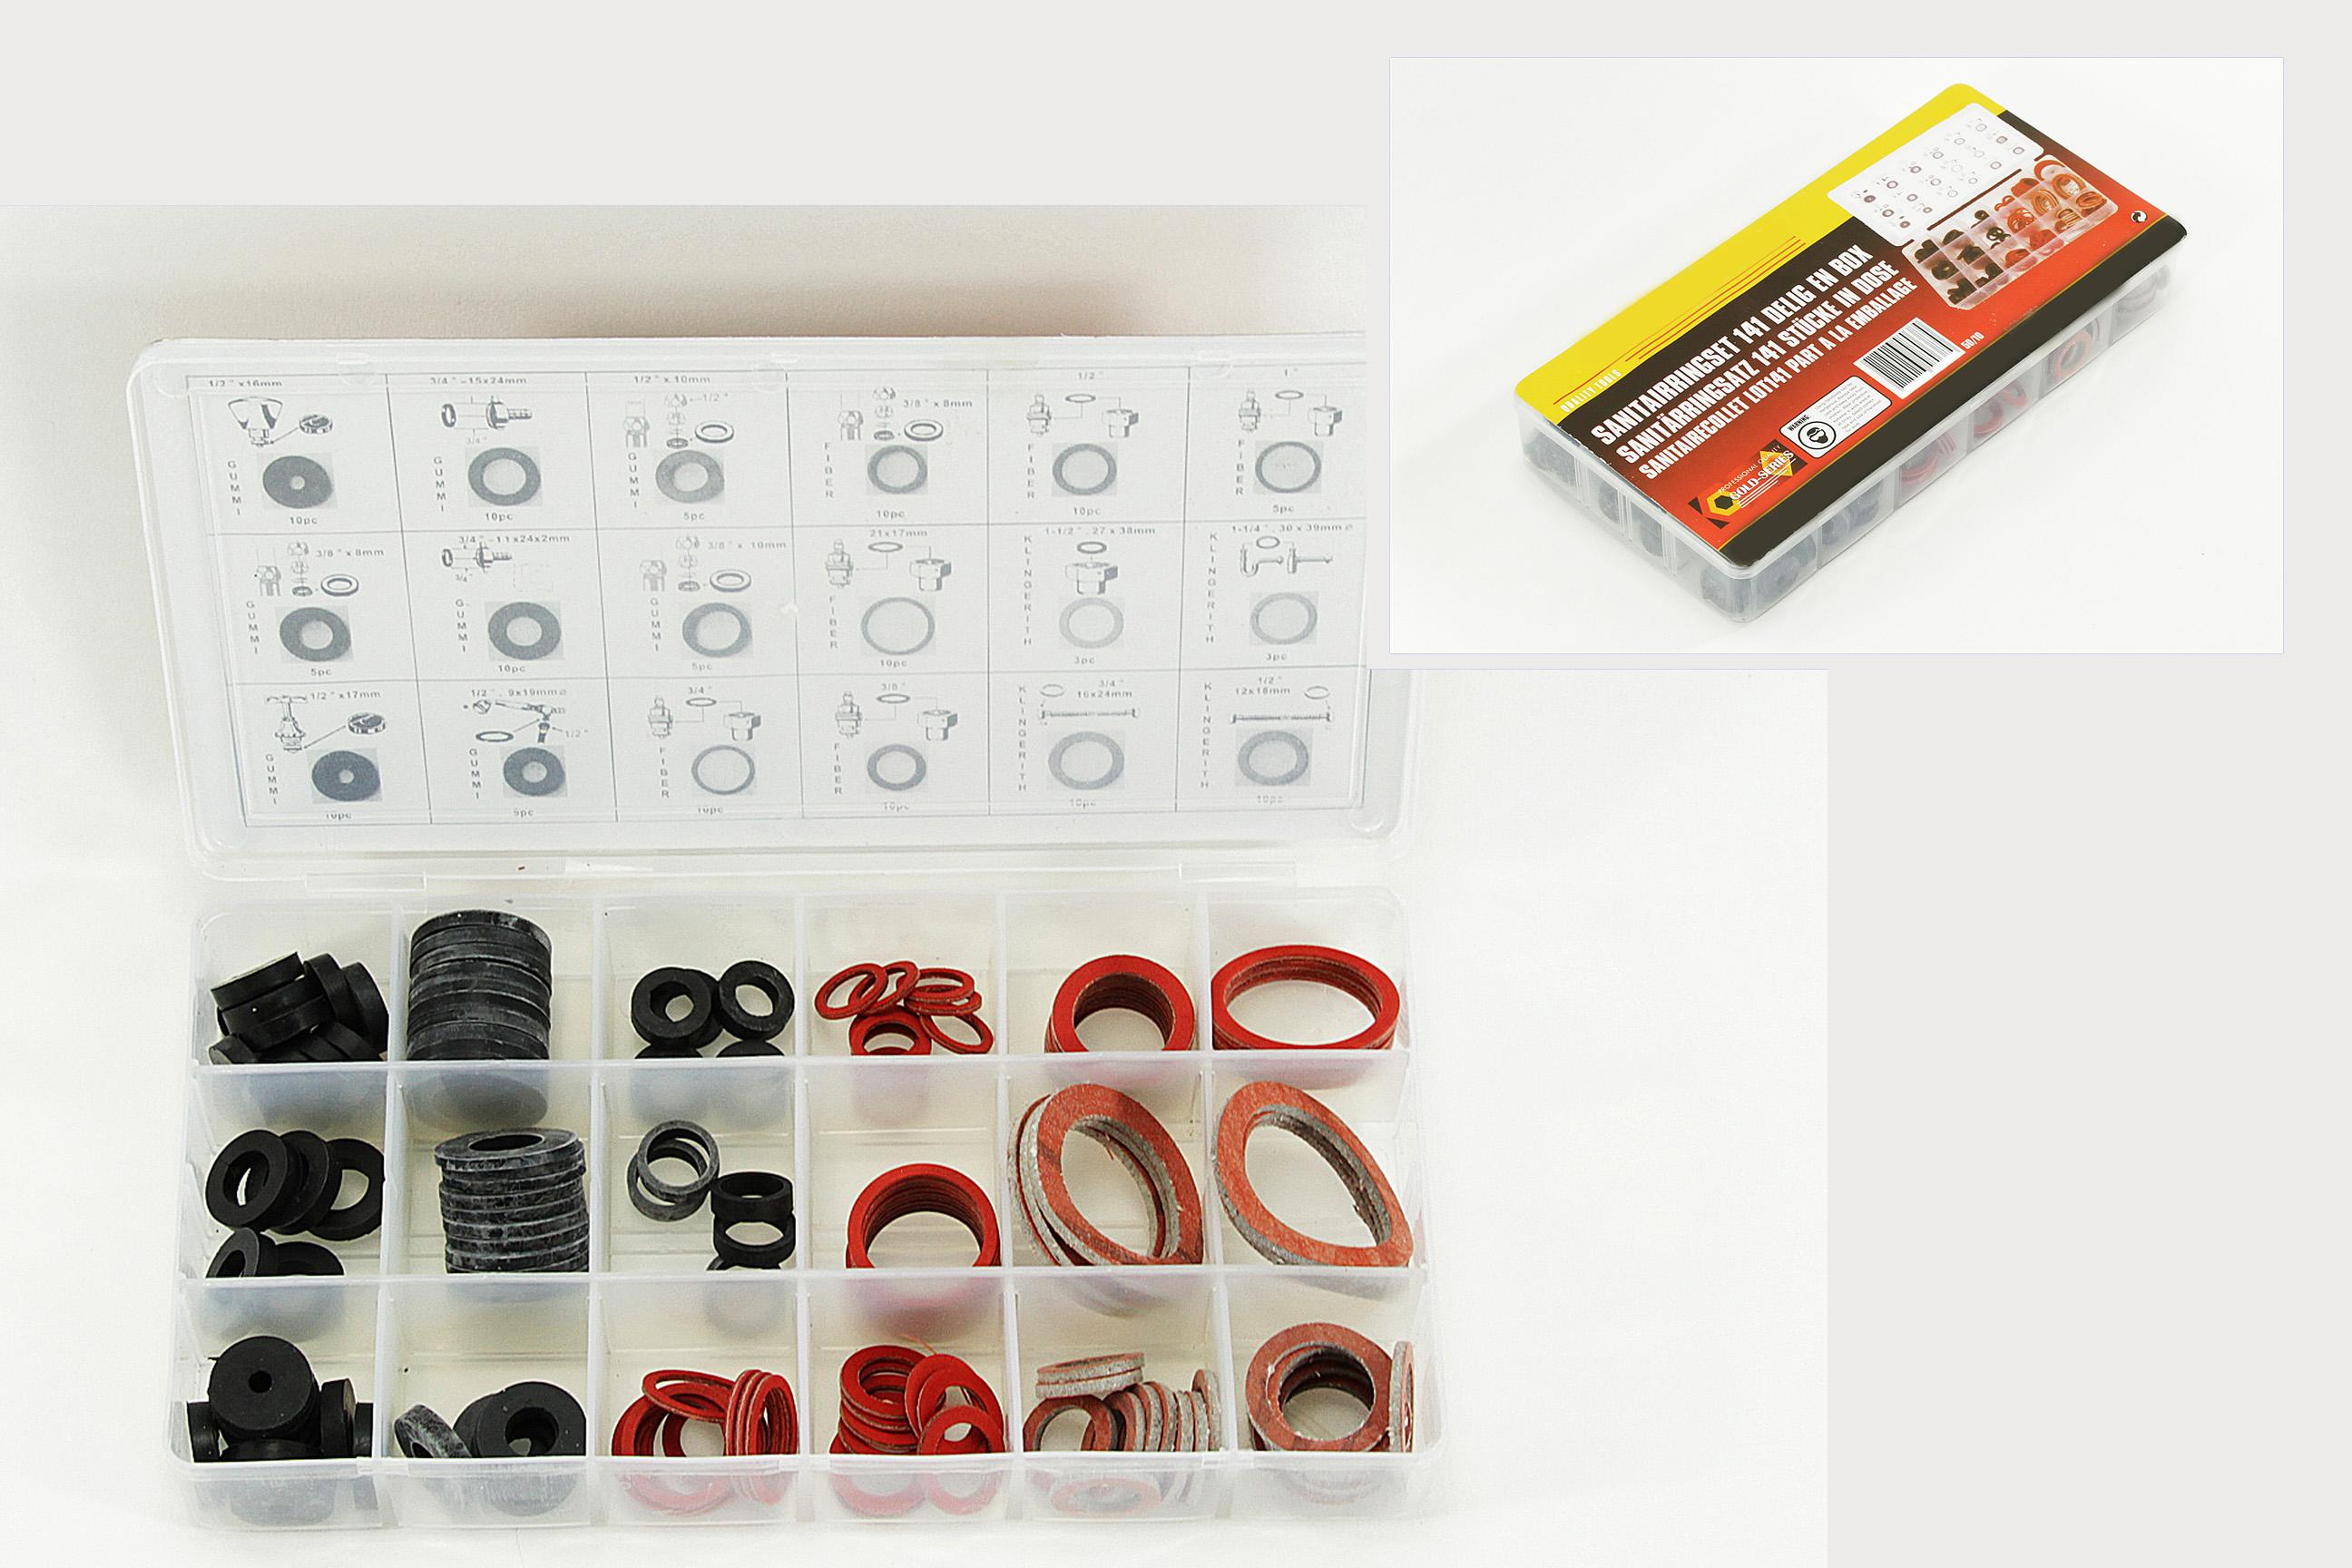 gummidichtung ring 141 tlg dichtring dichtungsring sanit r dichtungen neu ebay. Black Bedroom Furniture Sets. Home Design Ideas